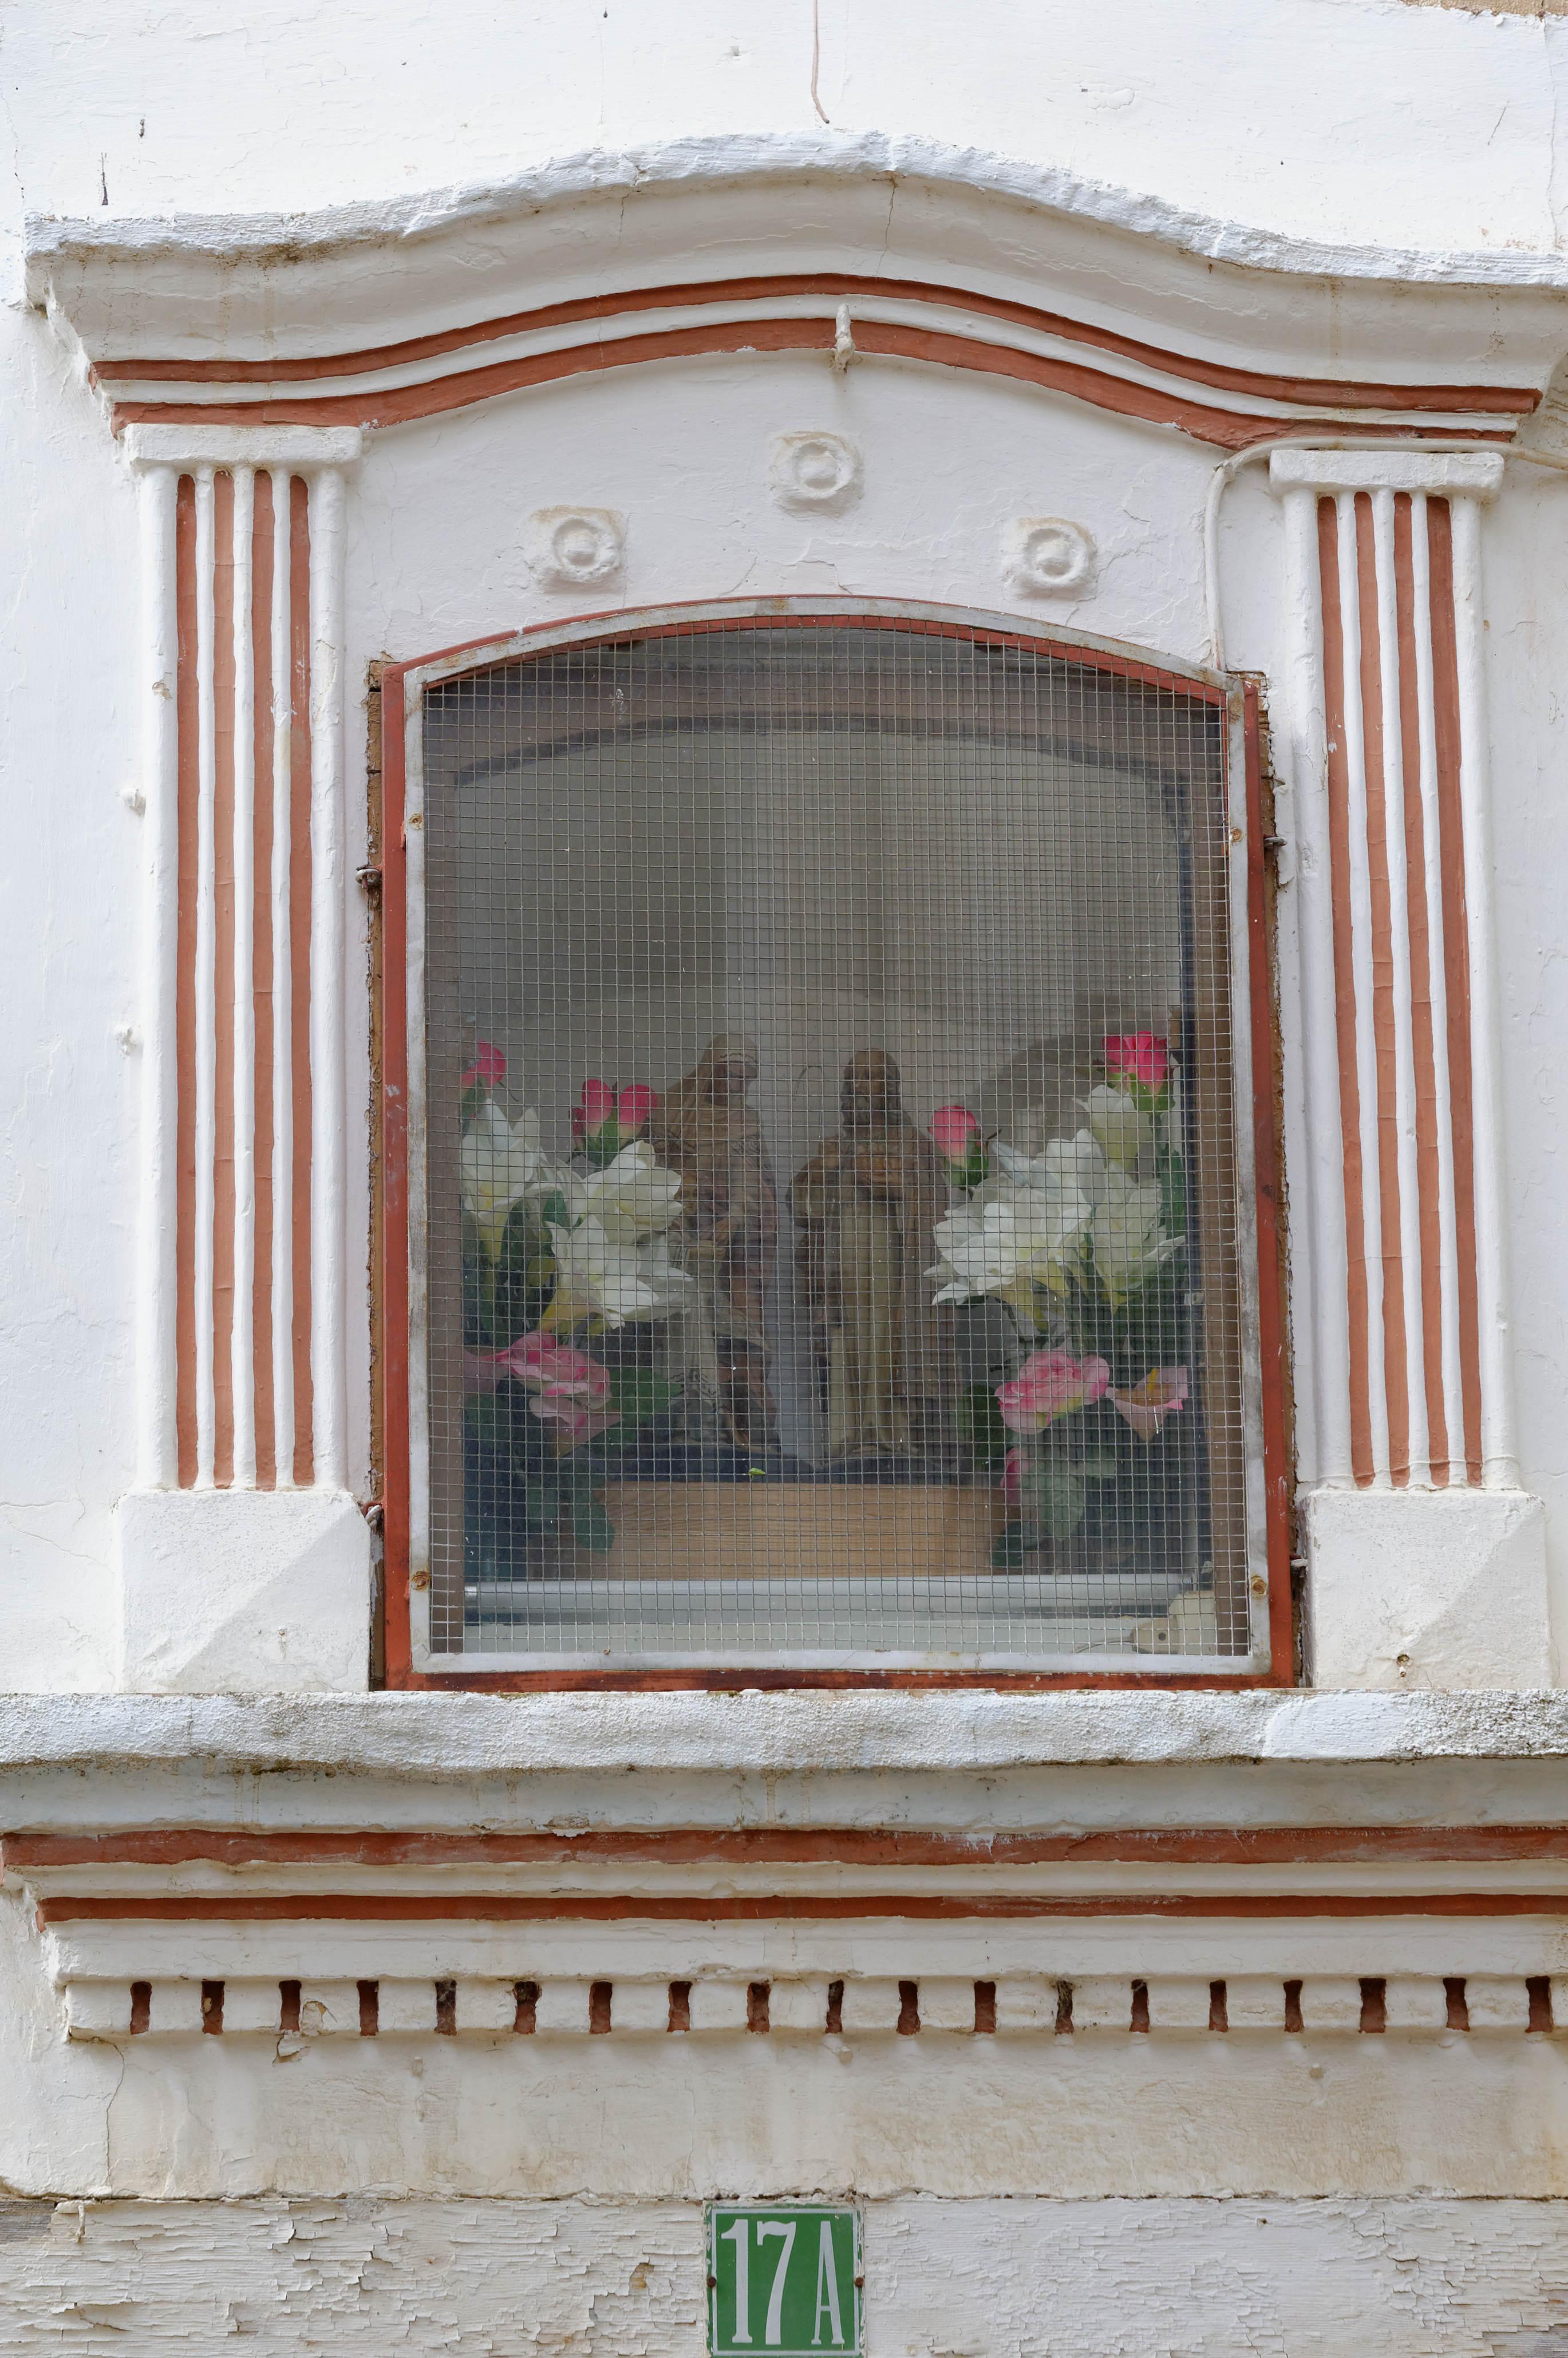 4309_Graus (Aragon)